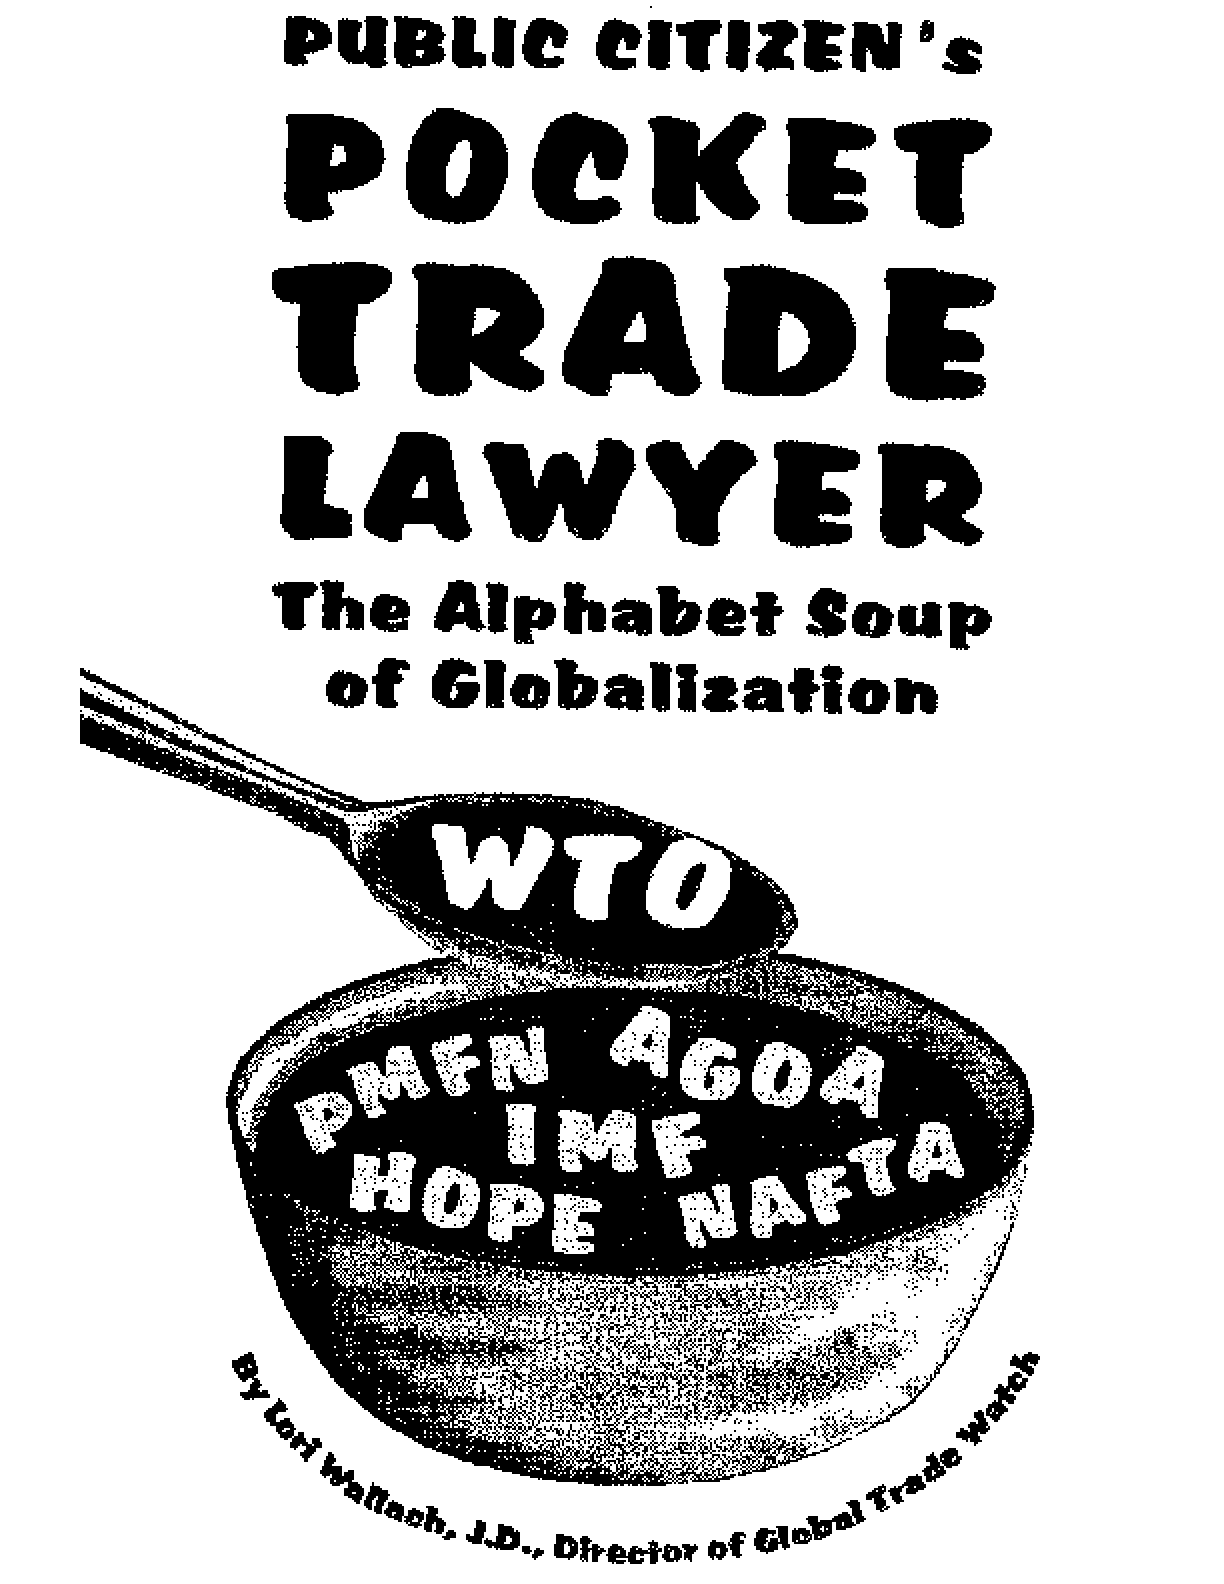 Public Citizen's Pocket Trade Lawyer: The Alphabet Soup of Globalization